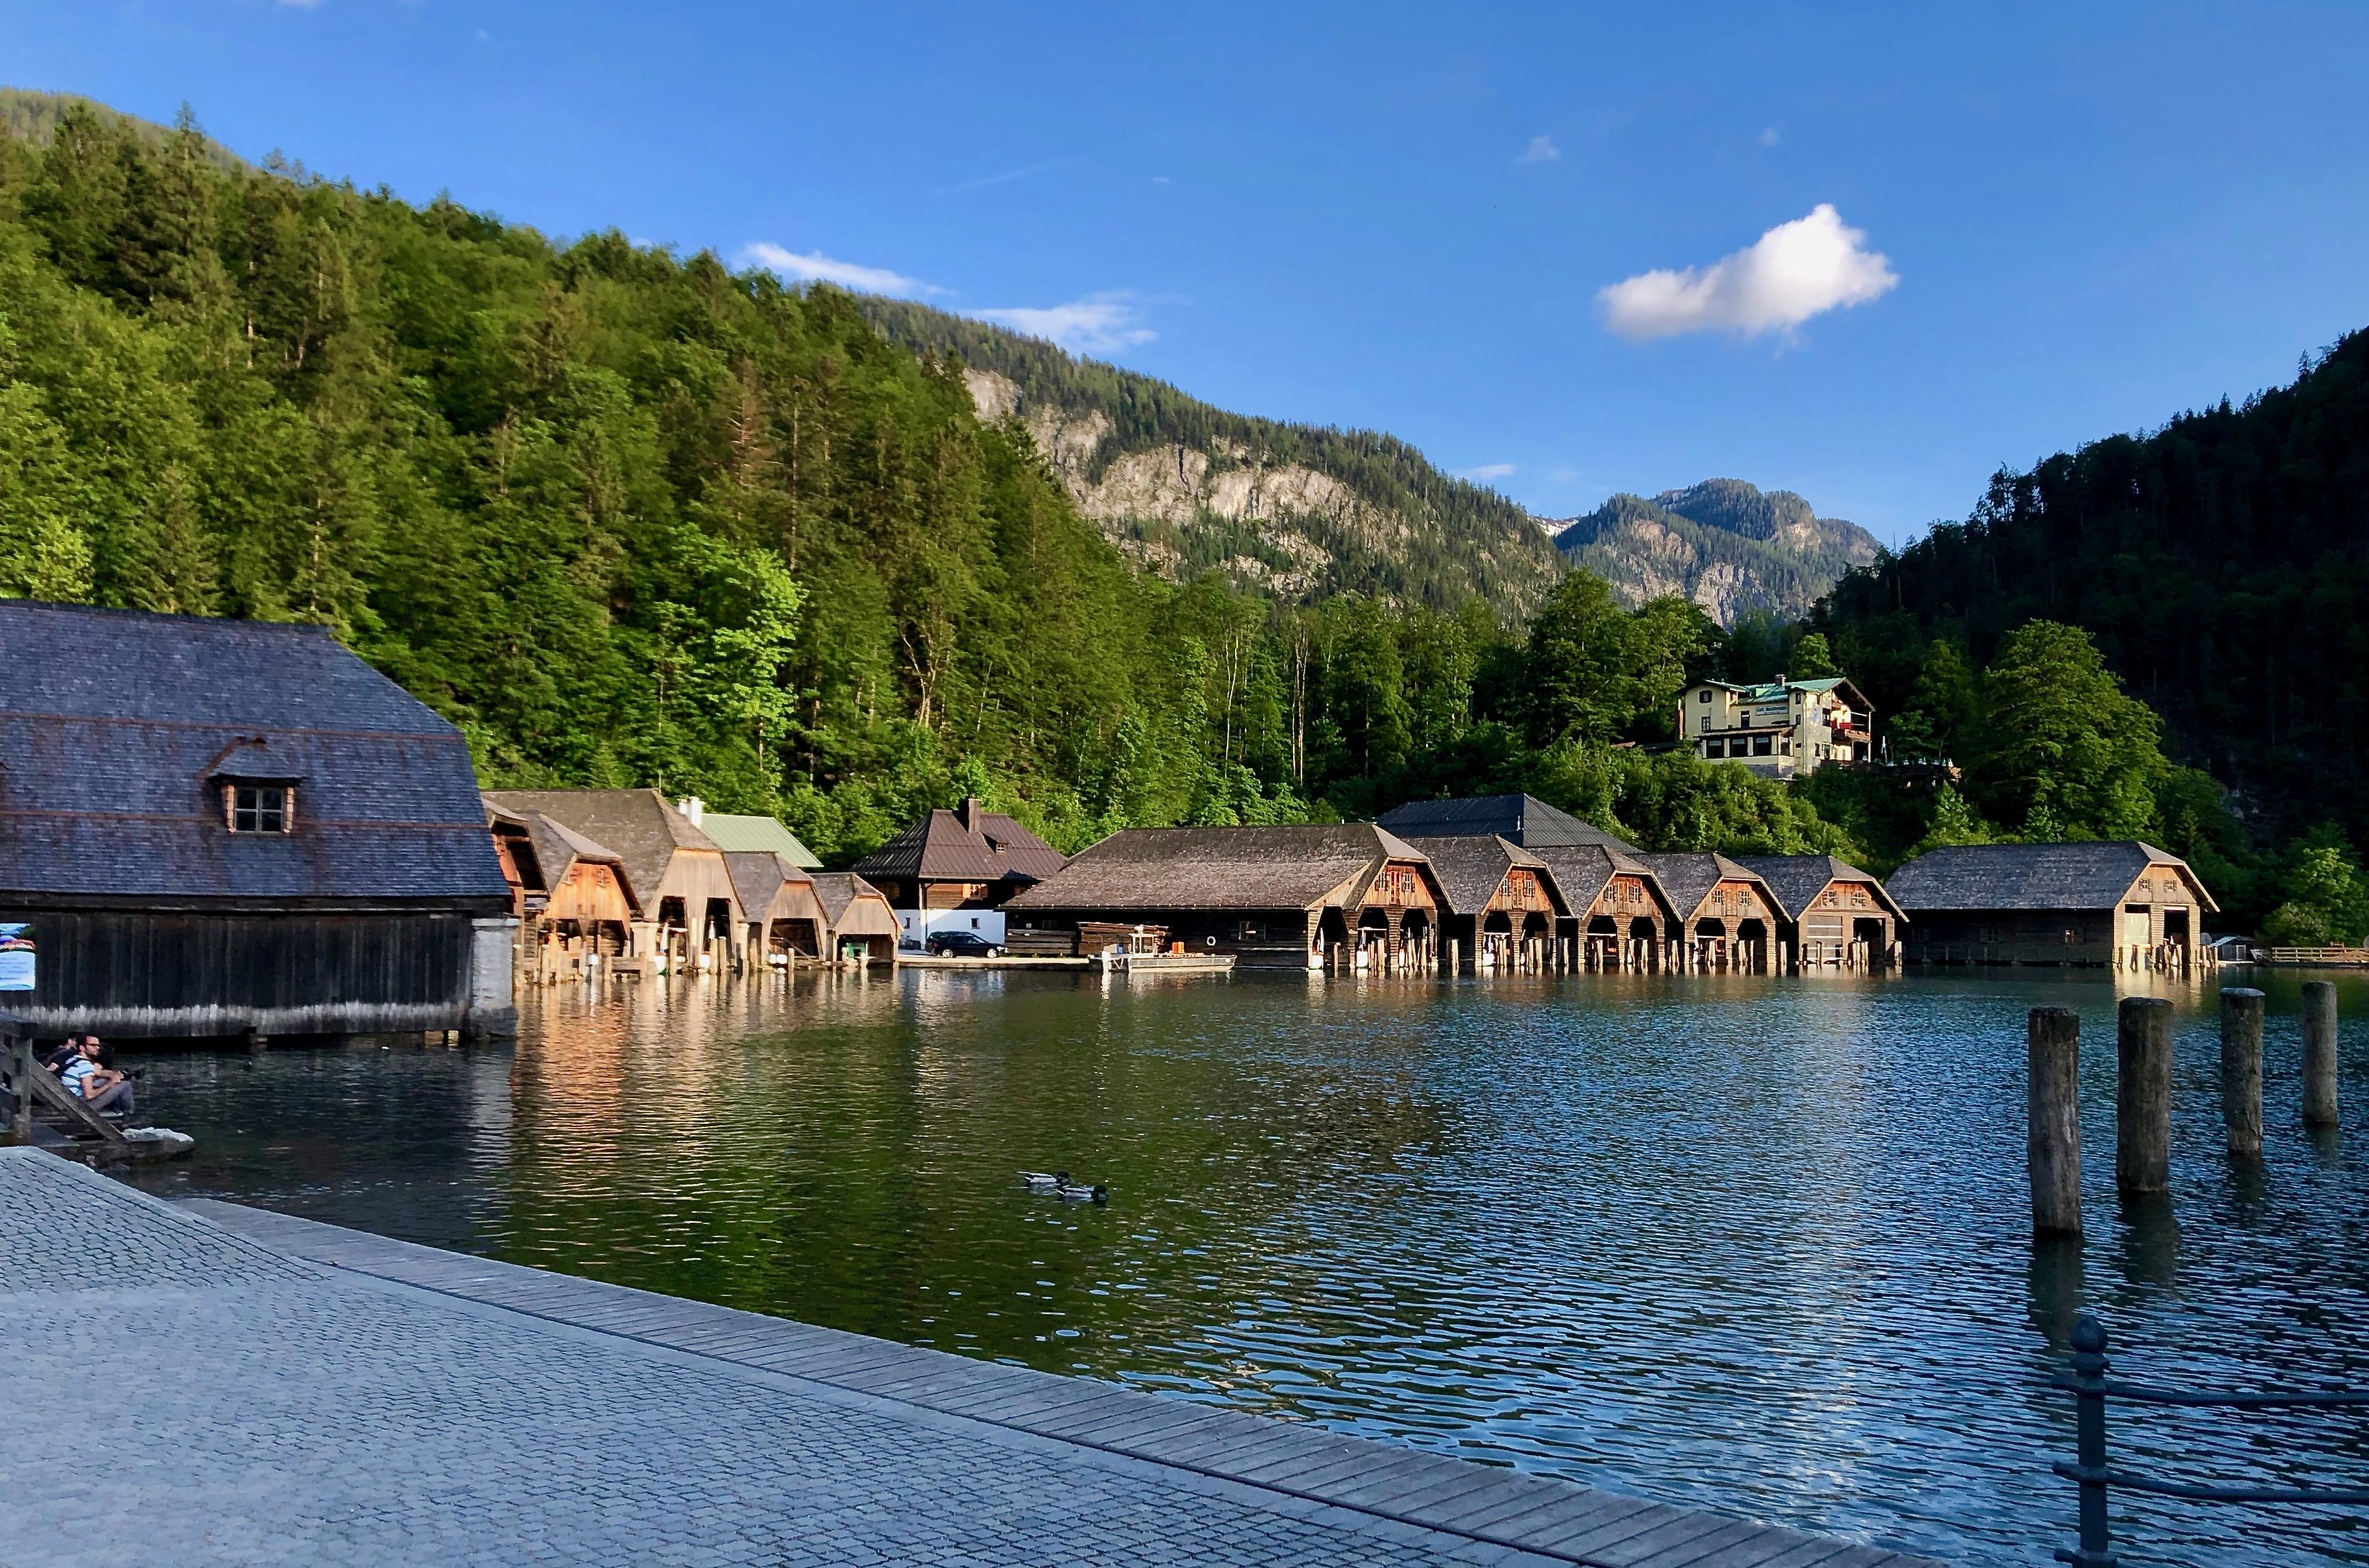 Apartment Berchtesgaden